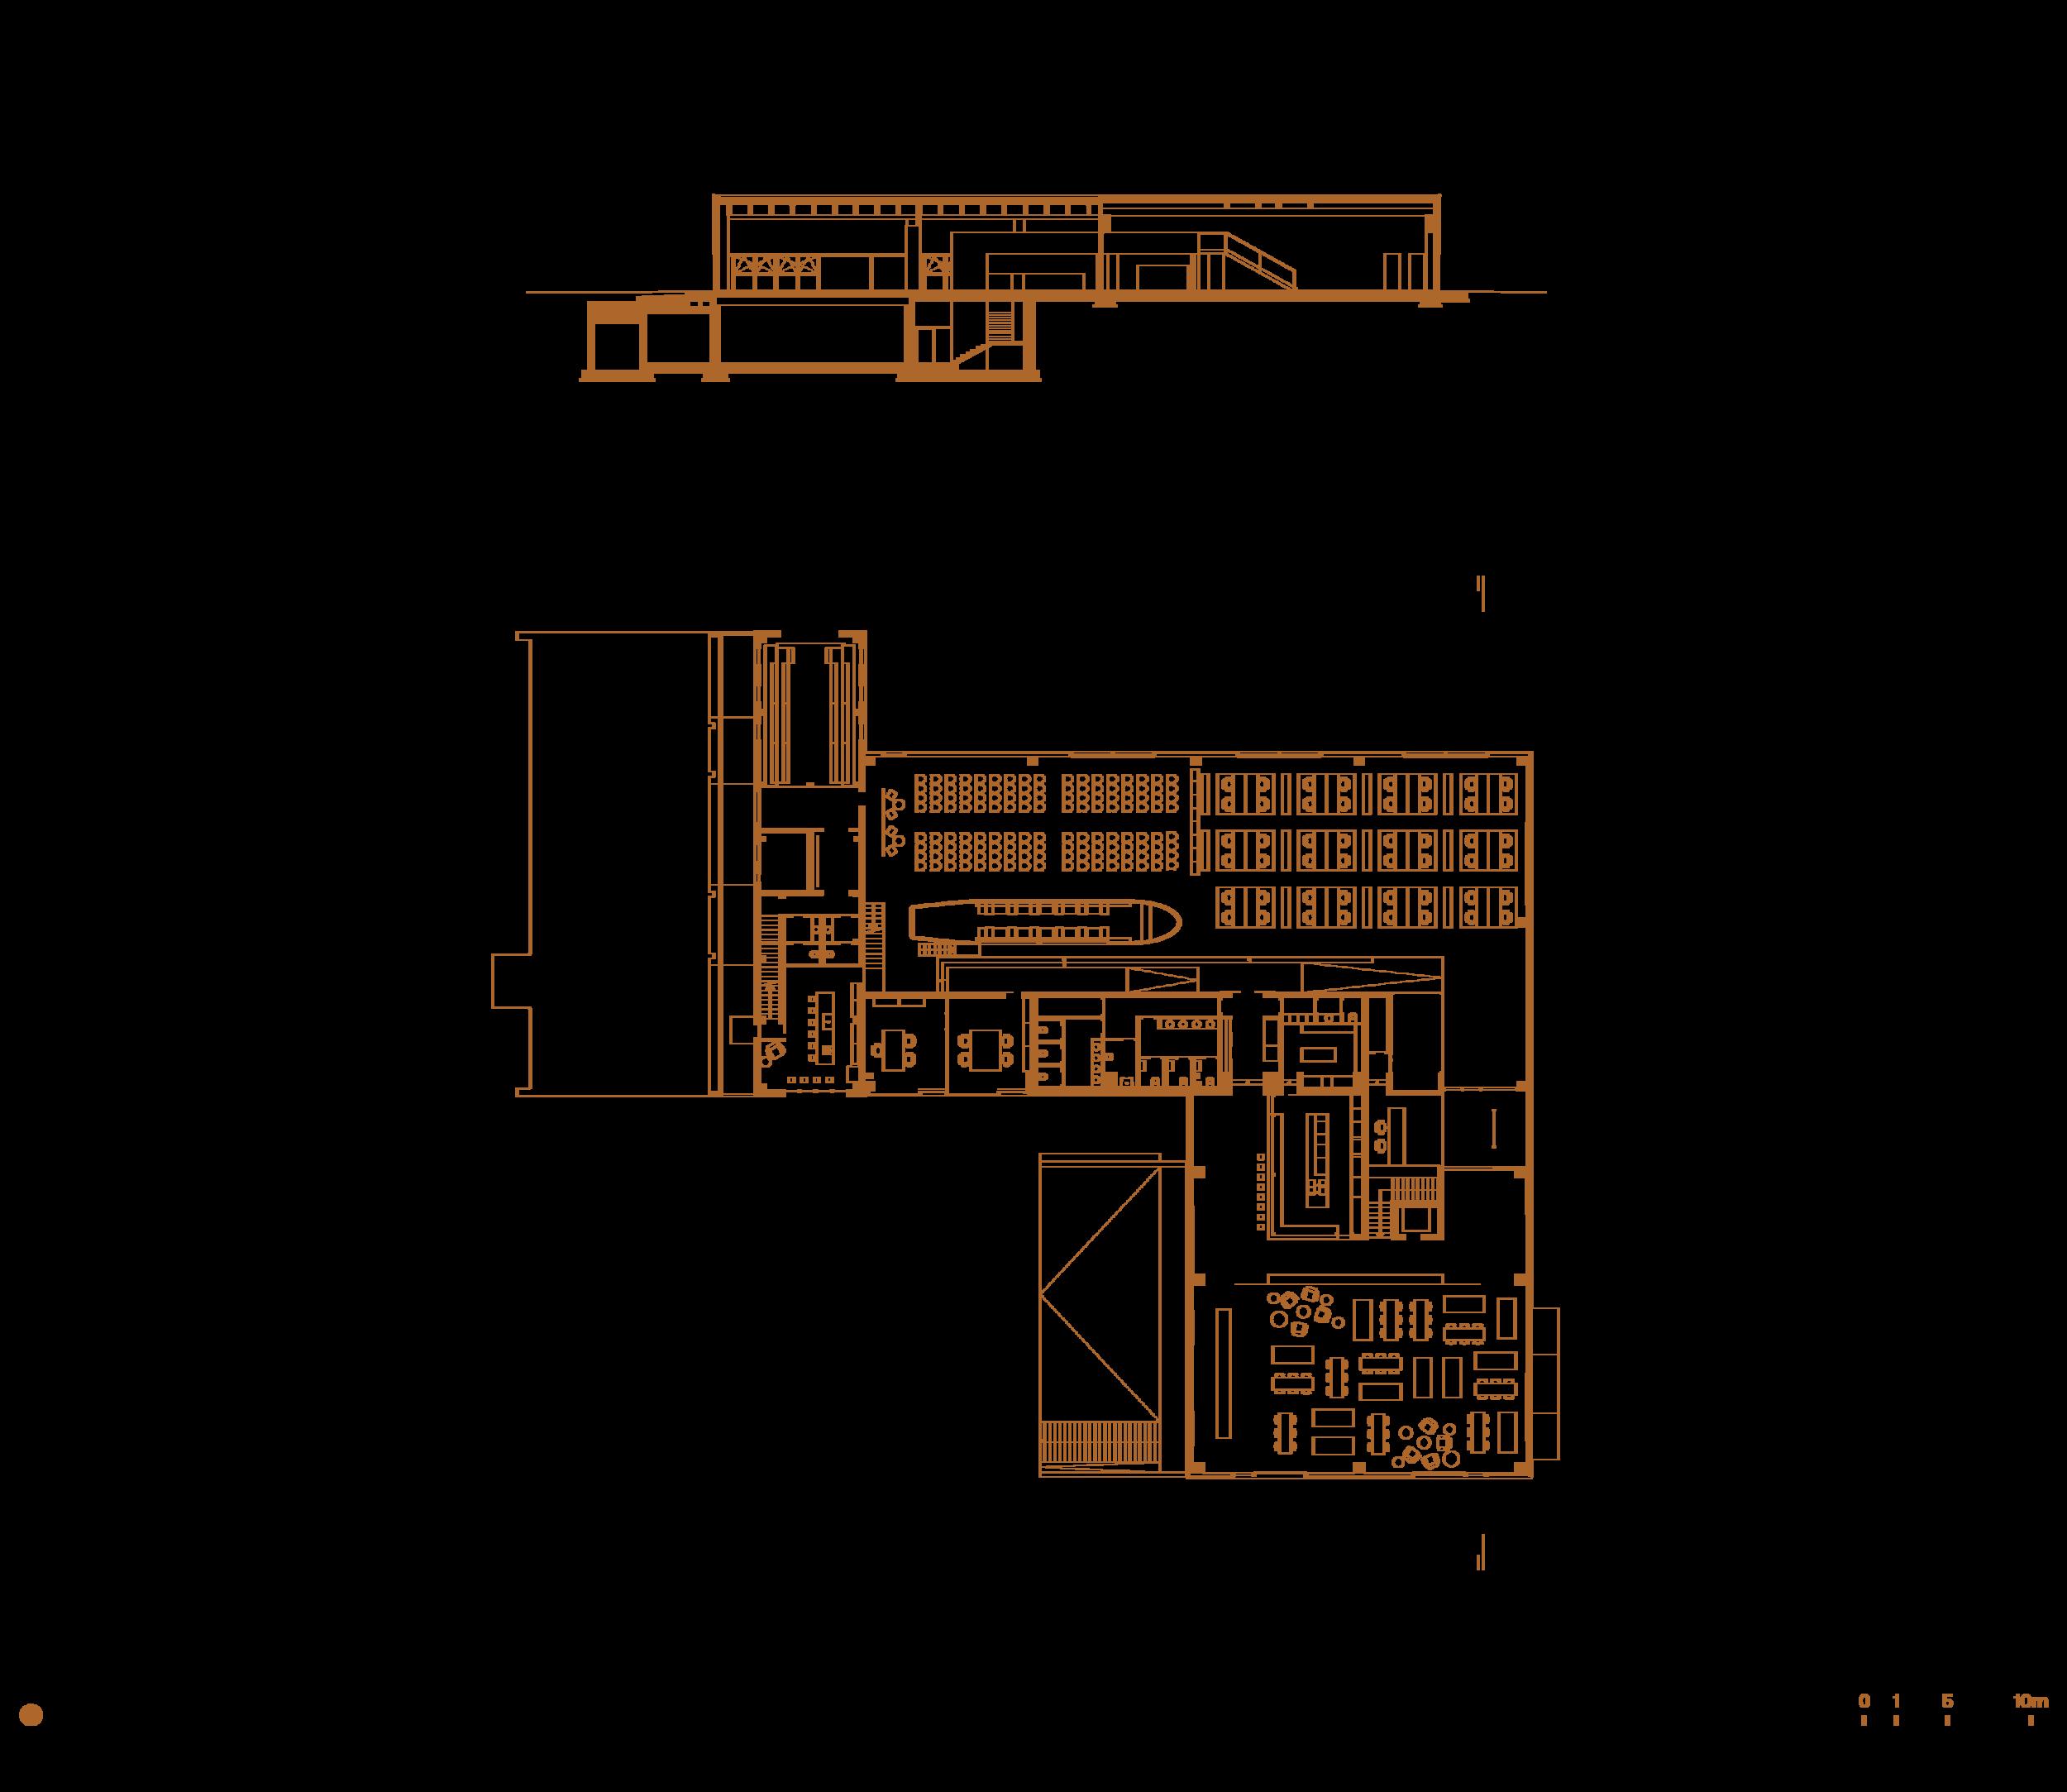 infinite-area-disegni-01.png